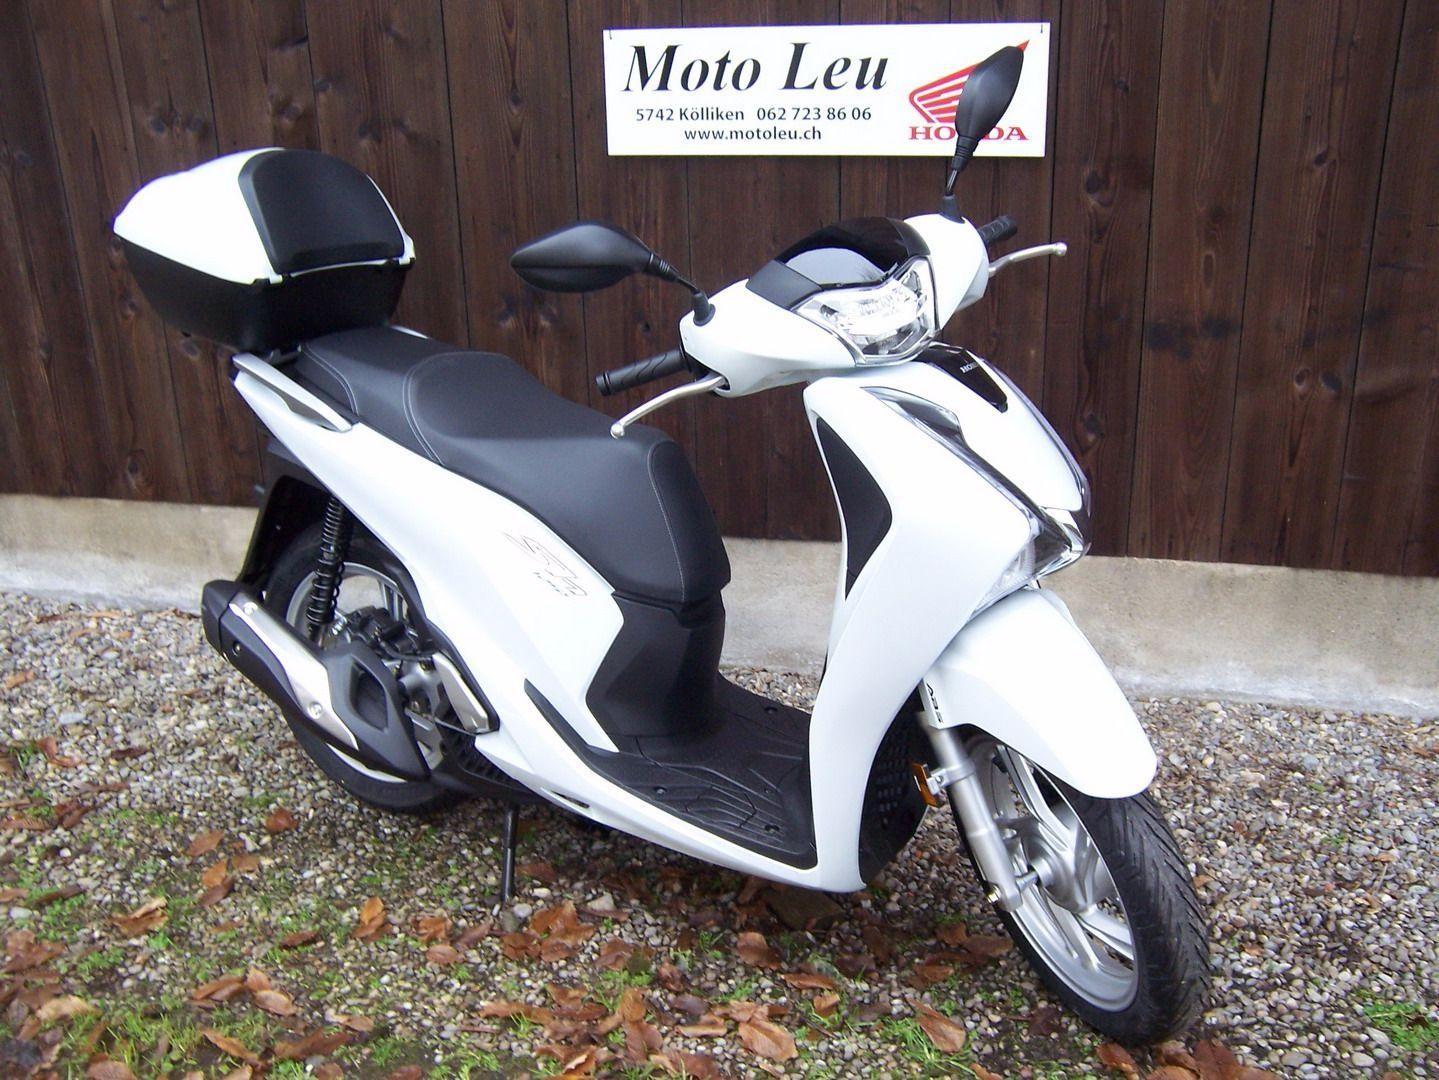 Buy Motorbike New Vehiclebike Honda Sh 125 Ad Abs Moto Leu Gmbh